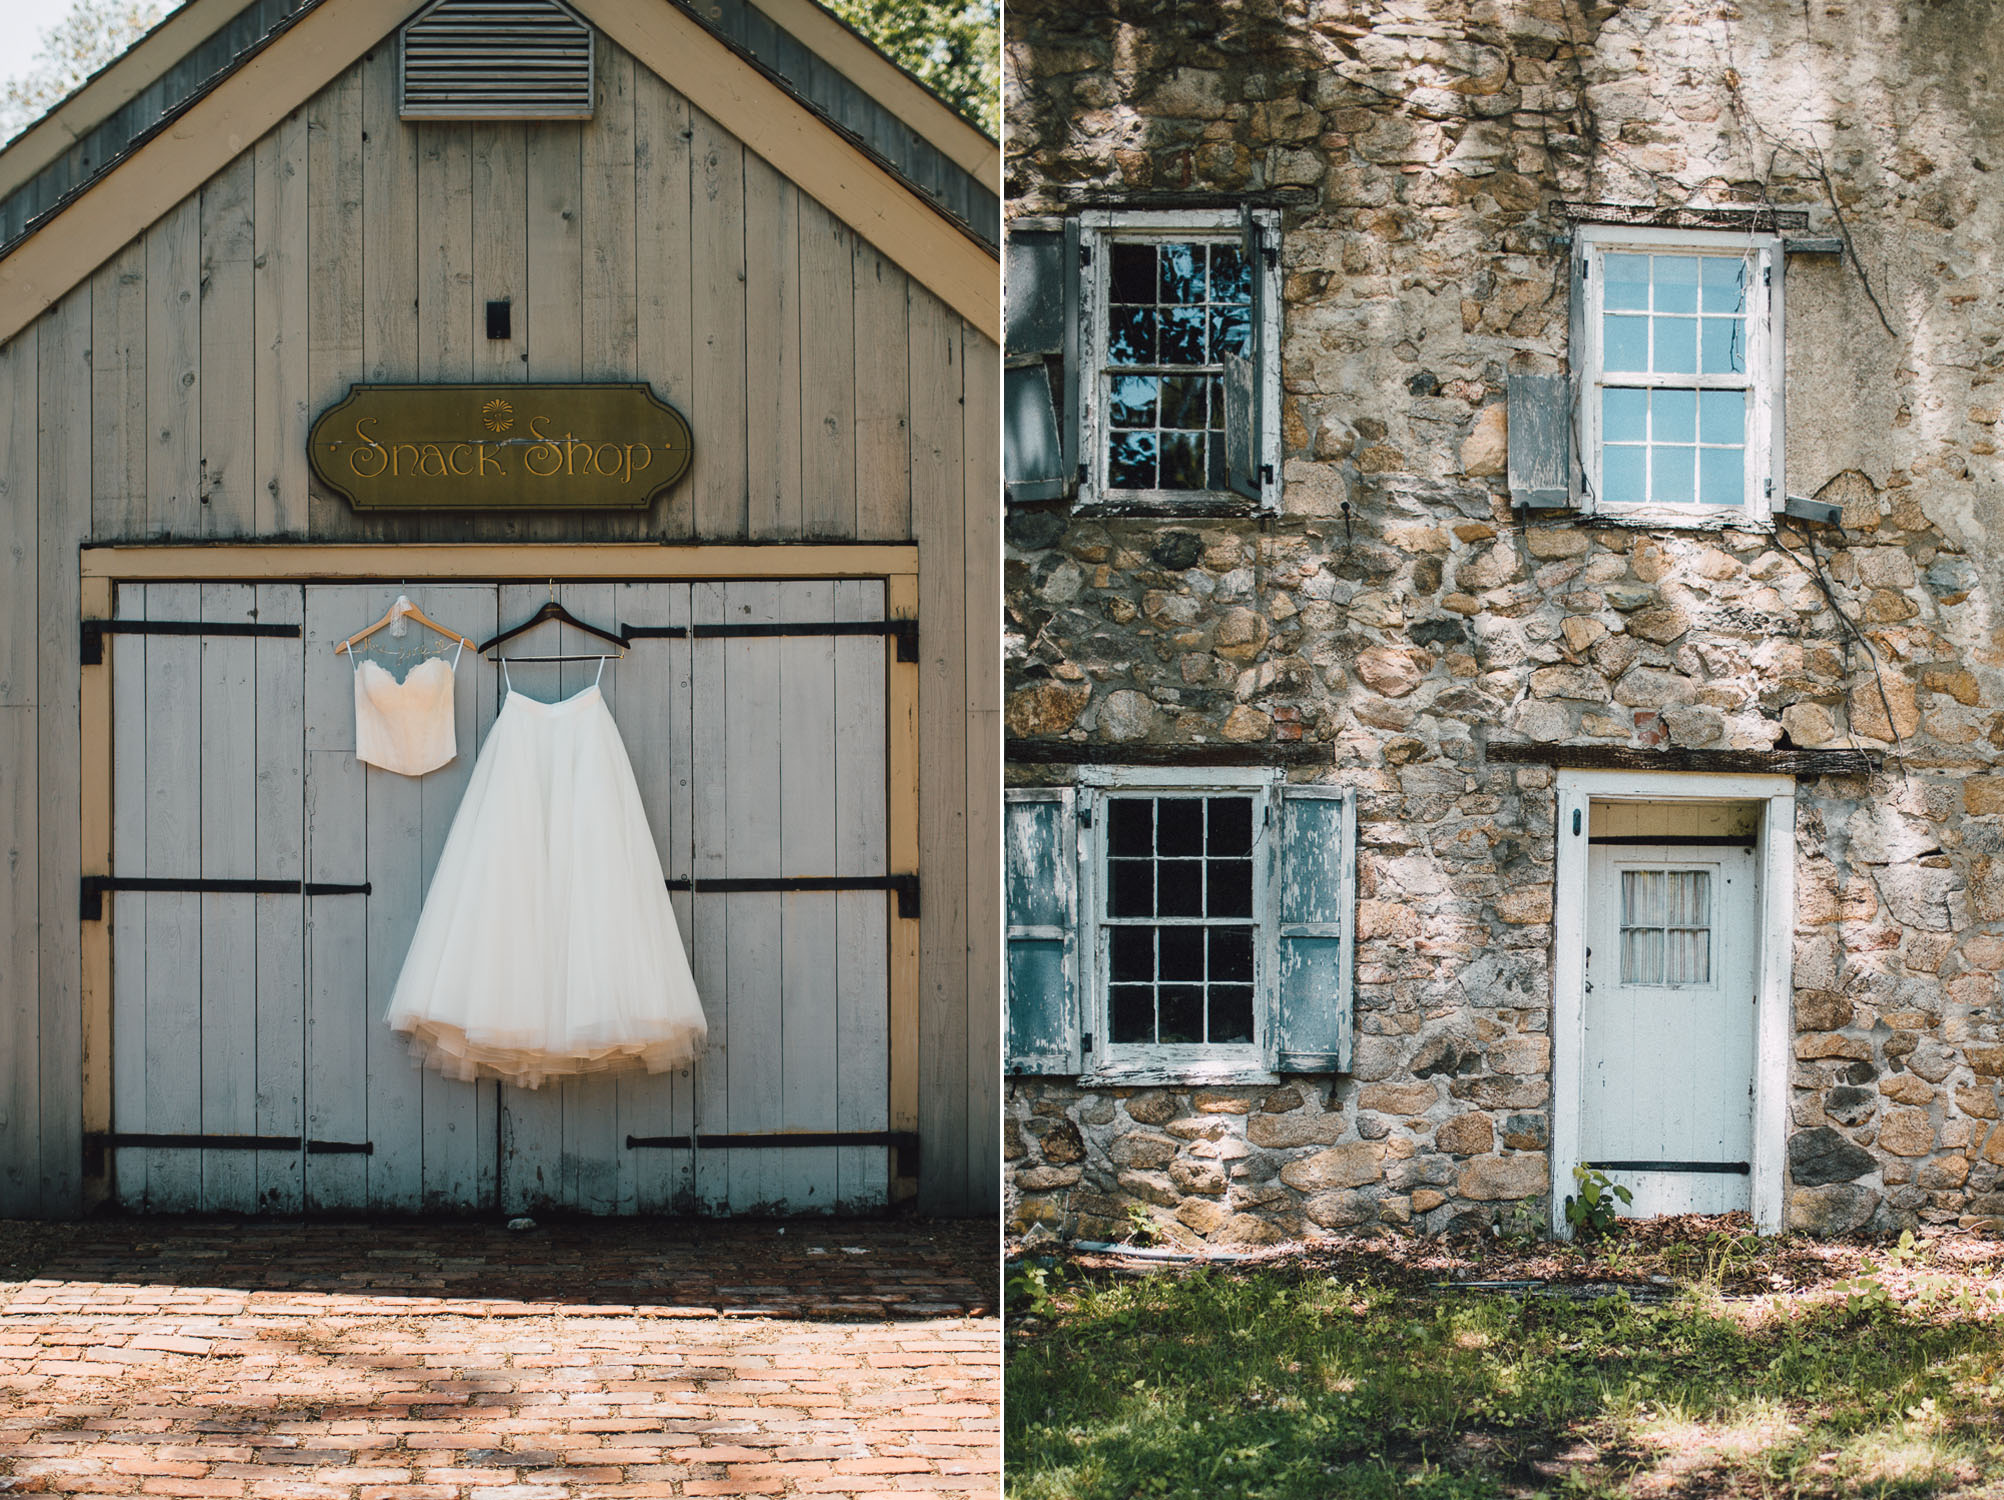 Waterloo-Village-Wedding-Photographer-Ethereal-Elegant-Woodsy-17 copy.jpg